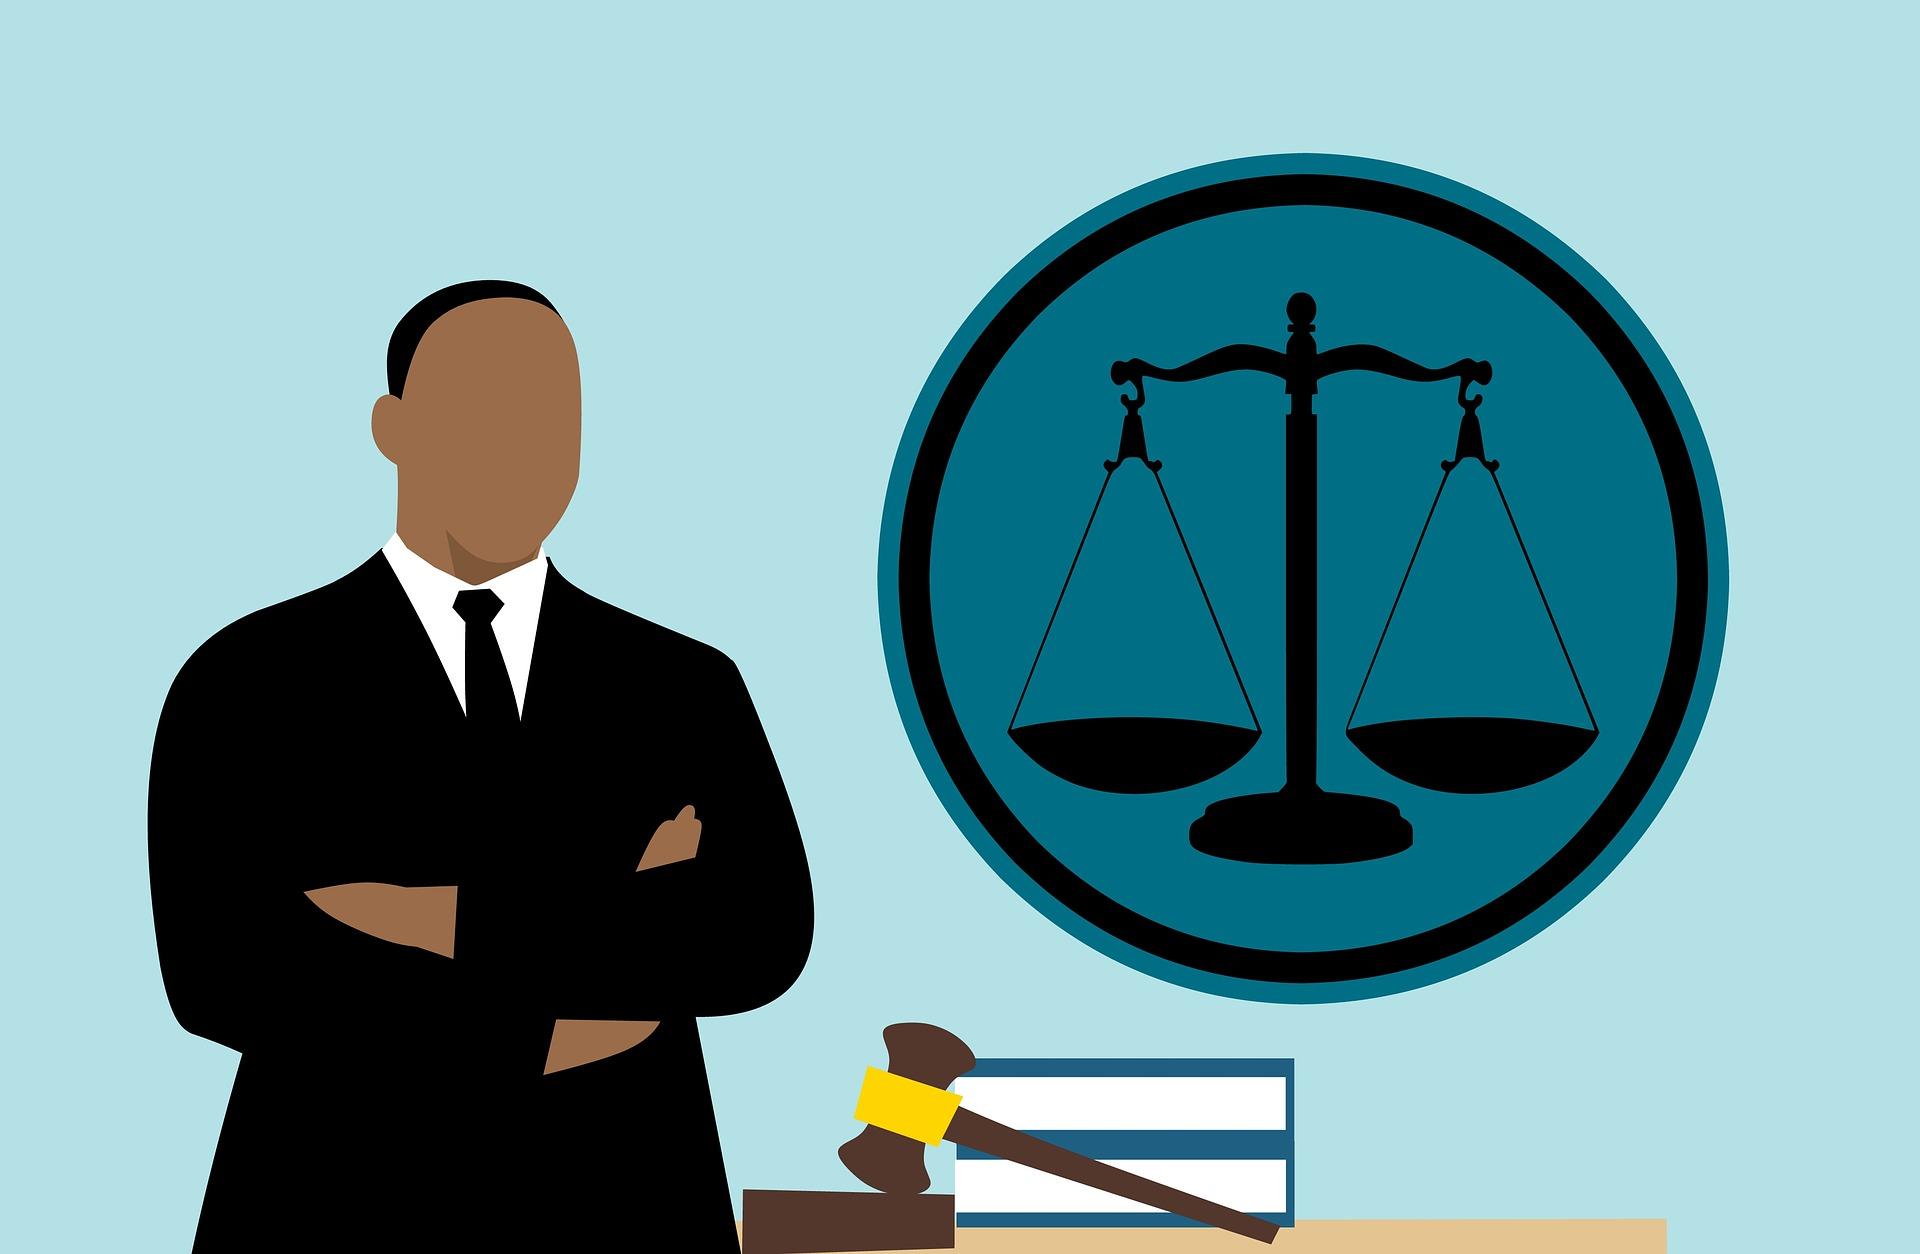 lawyer-3819044_1920